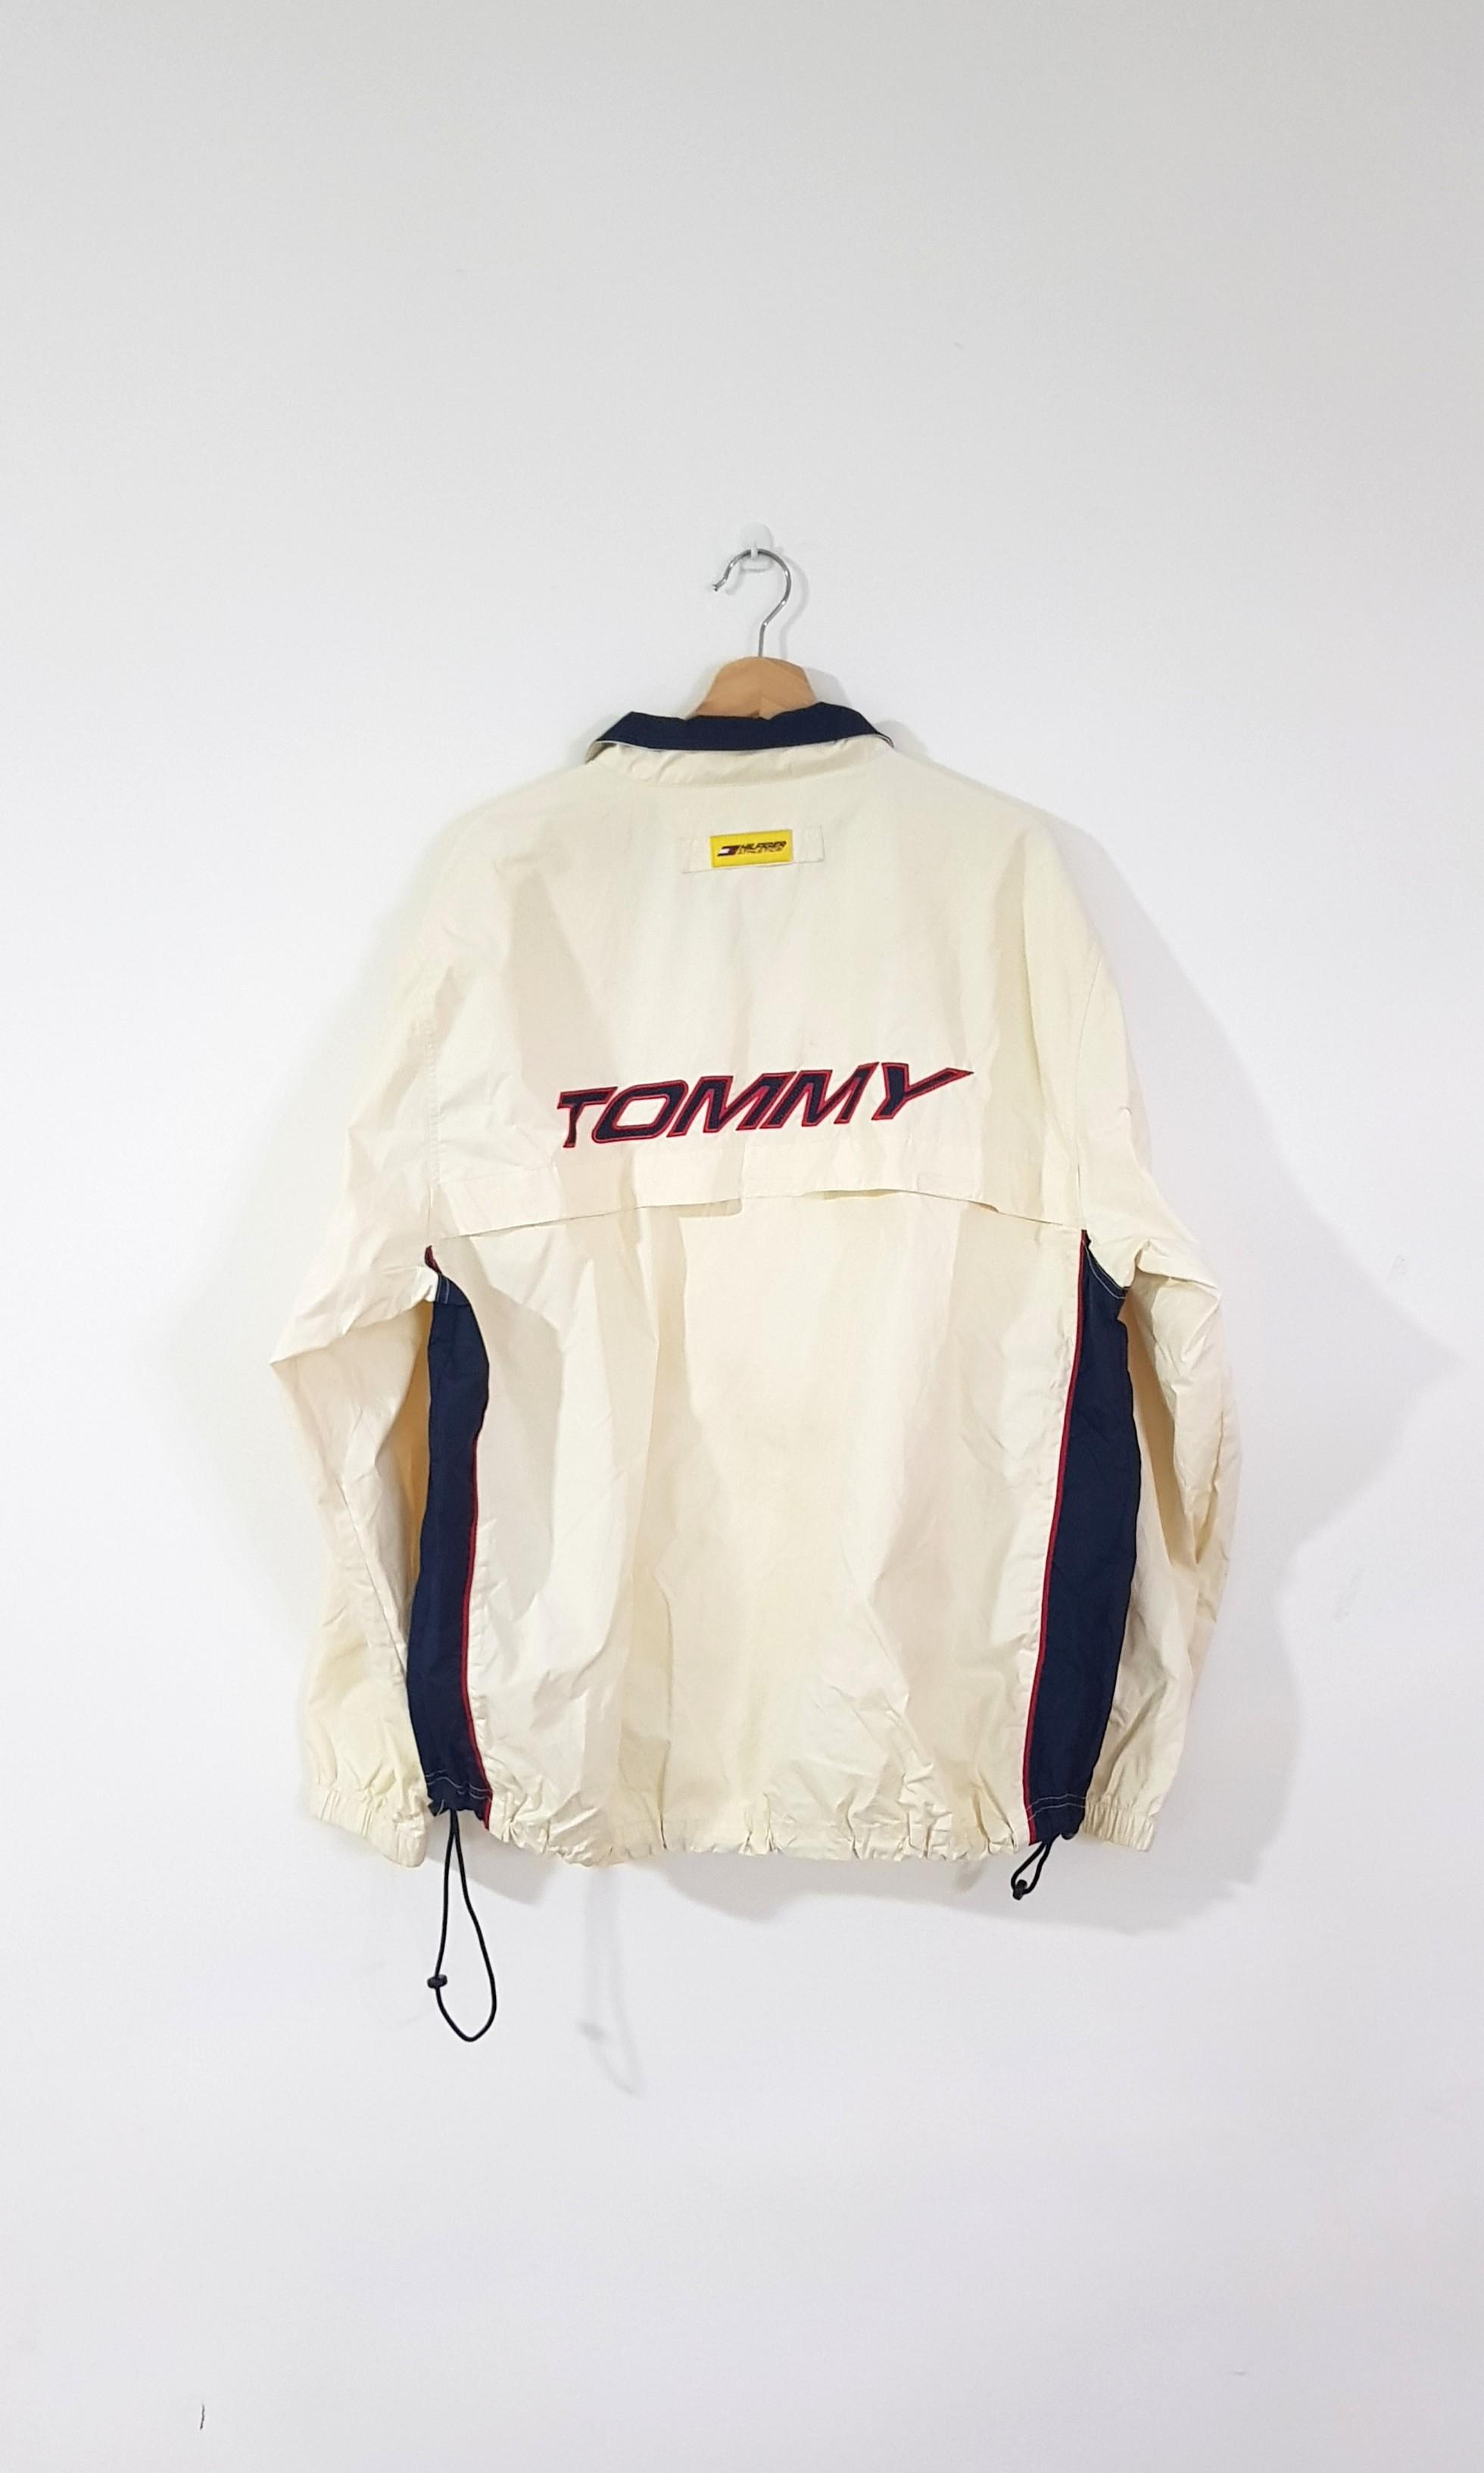 46c06878 Vintage Tommy Hilfiger Athletics Spellout Windbreaker, Men's Fashion ...